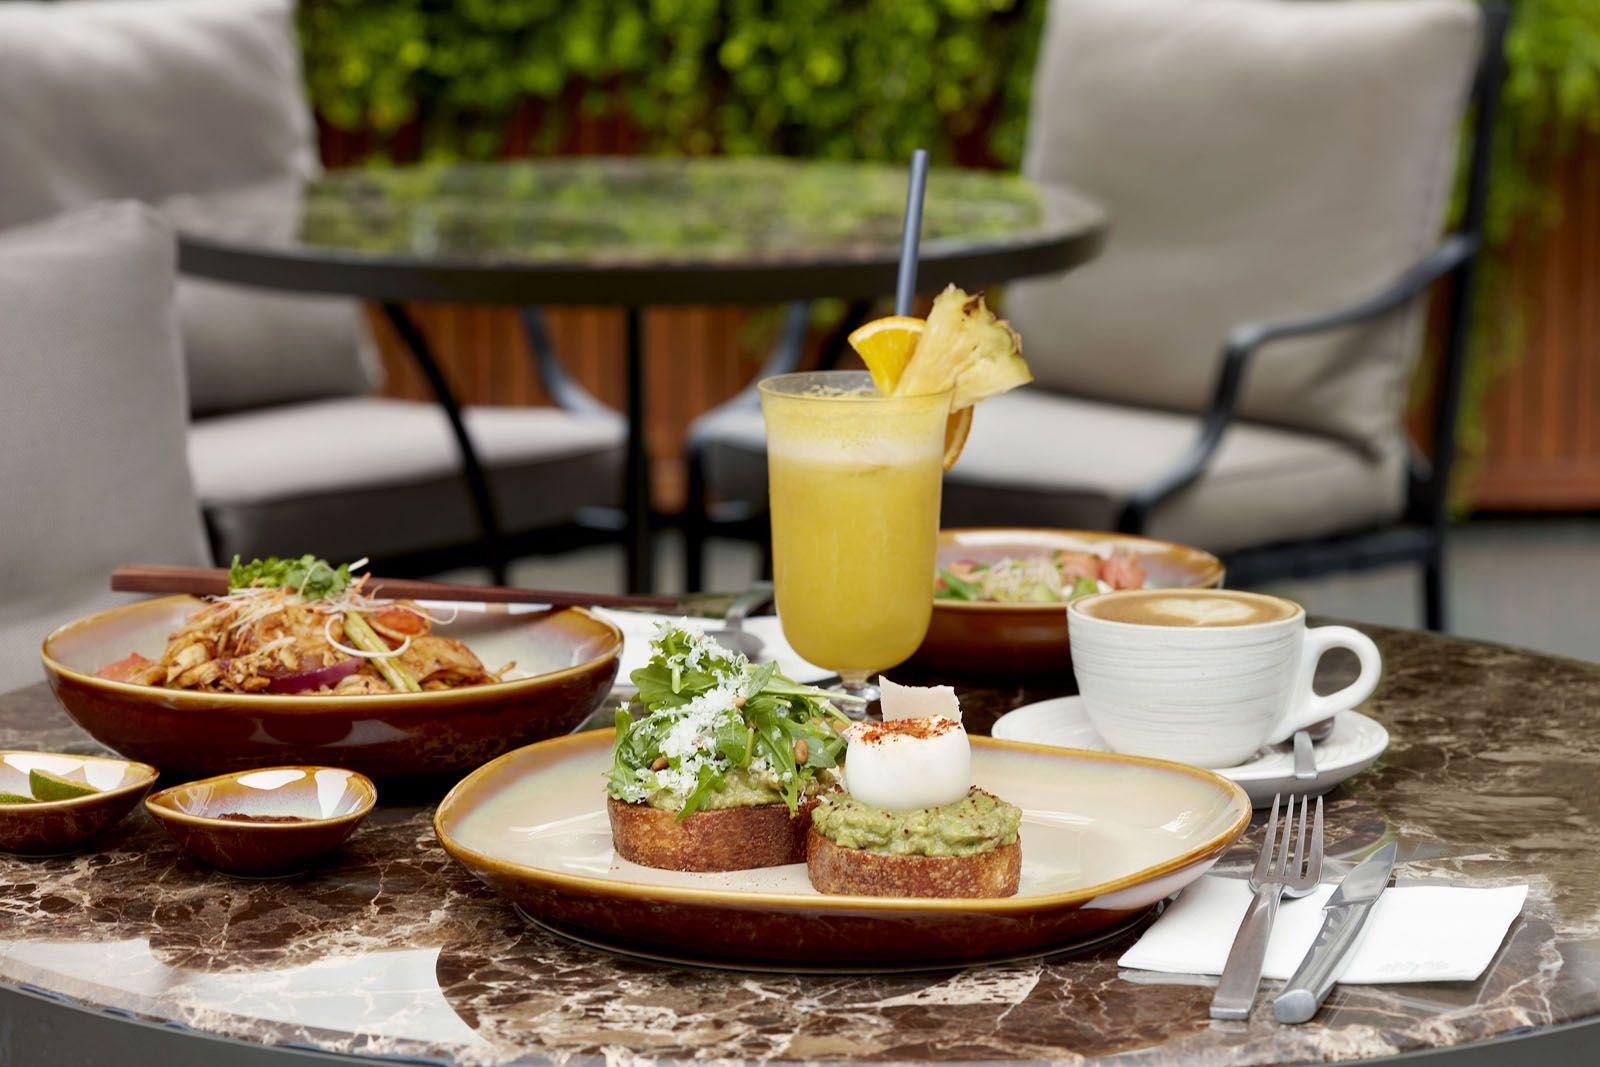 The Best Brunches in Singapore 2020: Madame Fan, La Brasserie, Raffles Courtyard, Clan Café, Bochinche